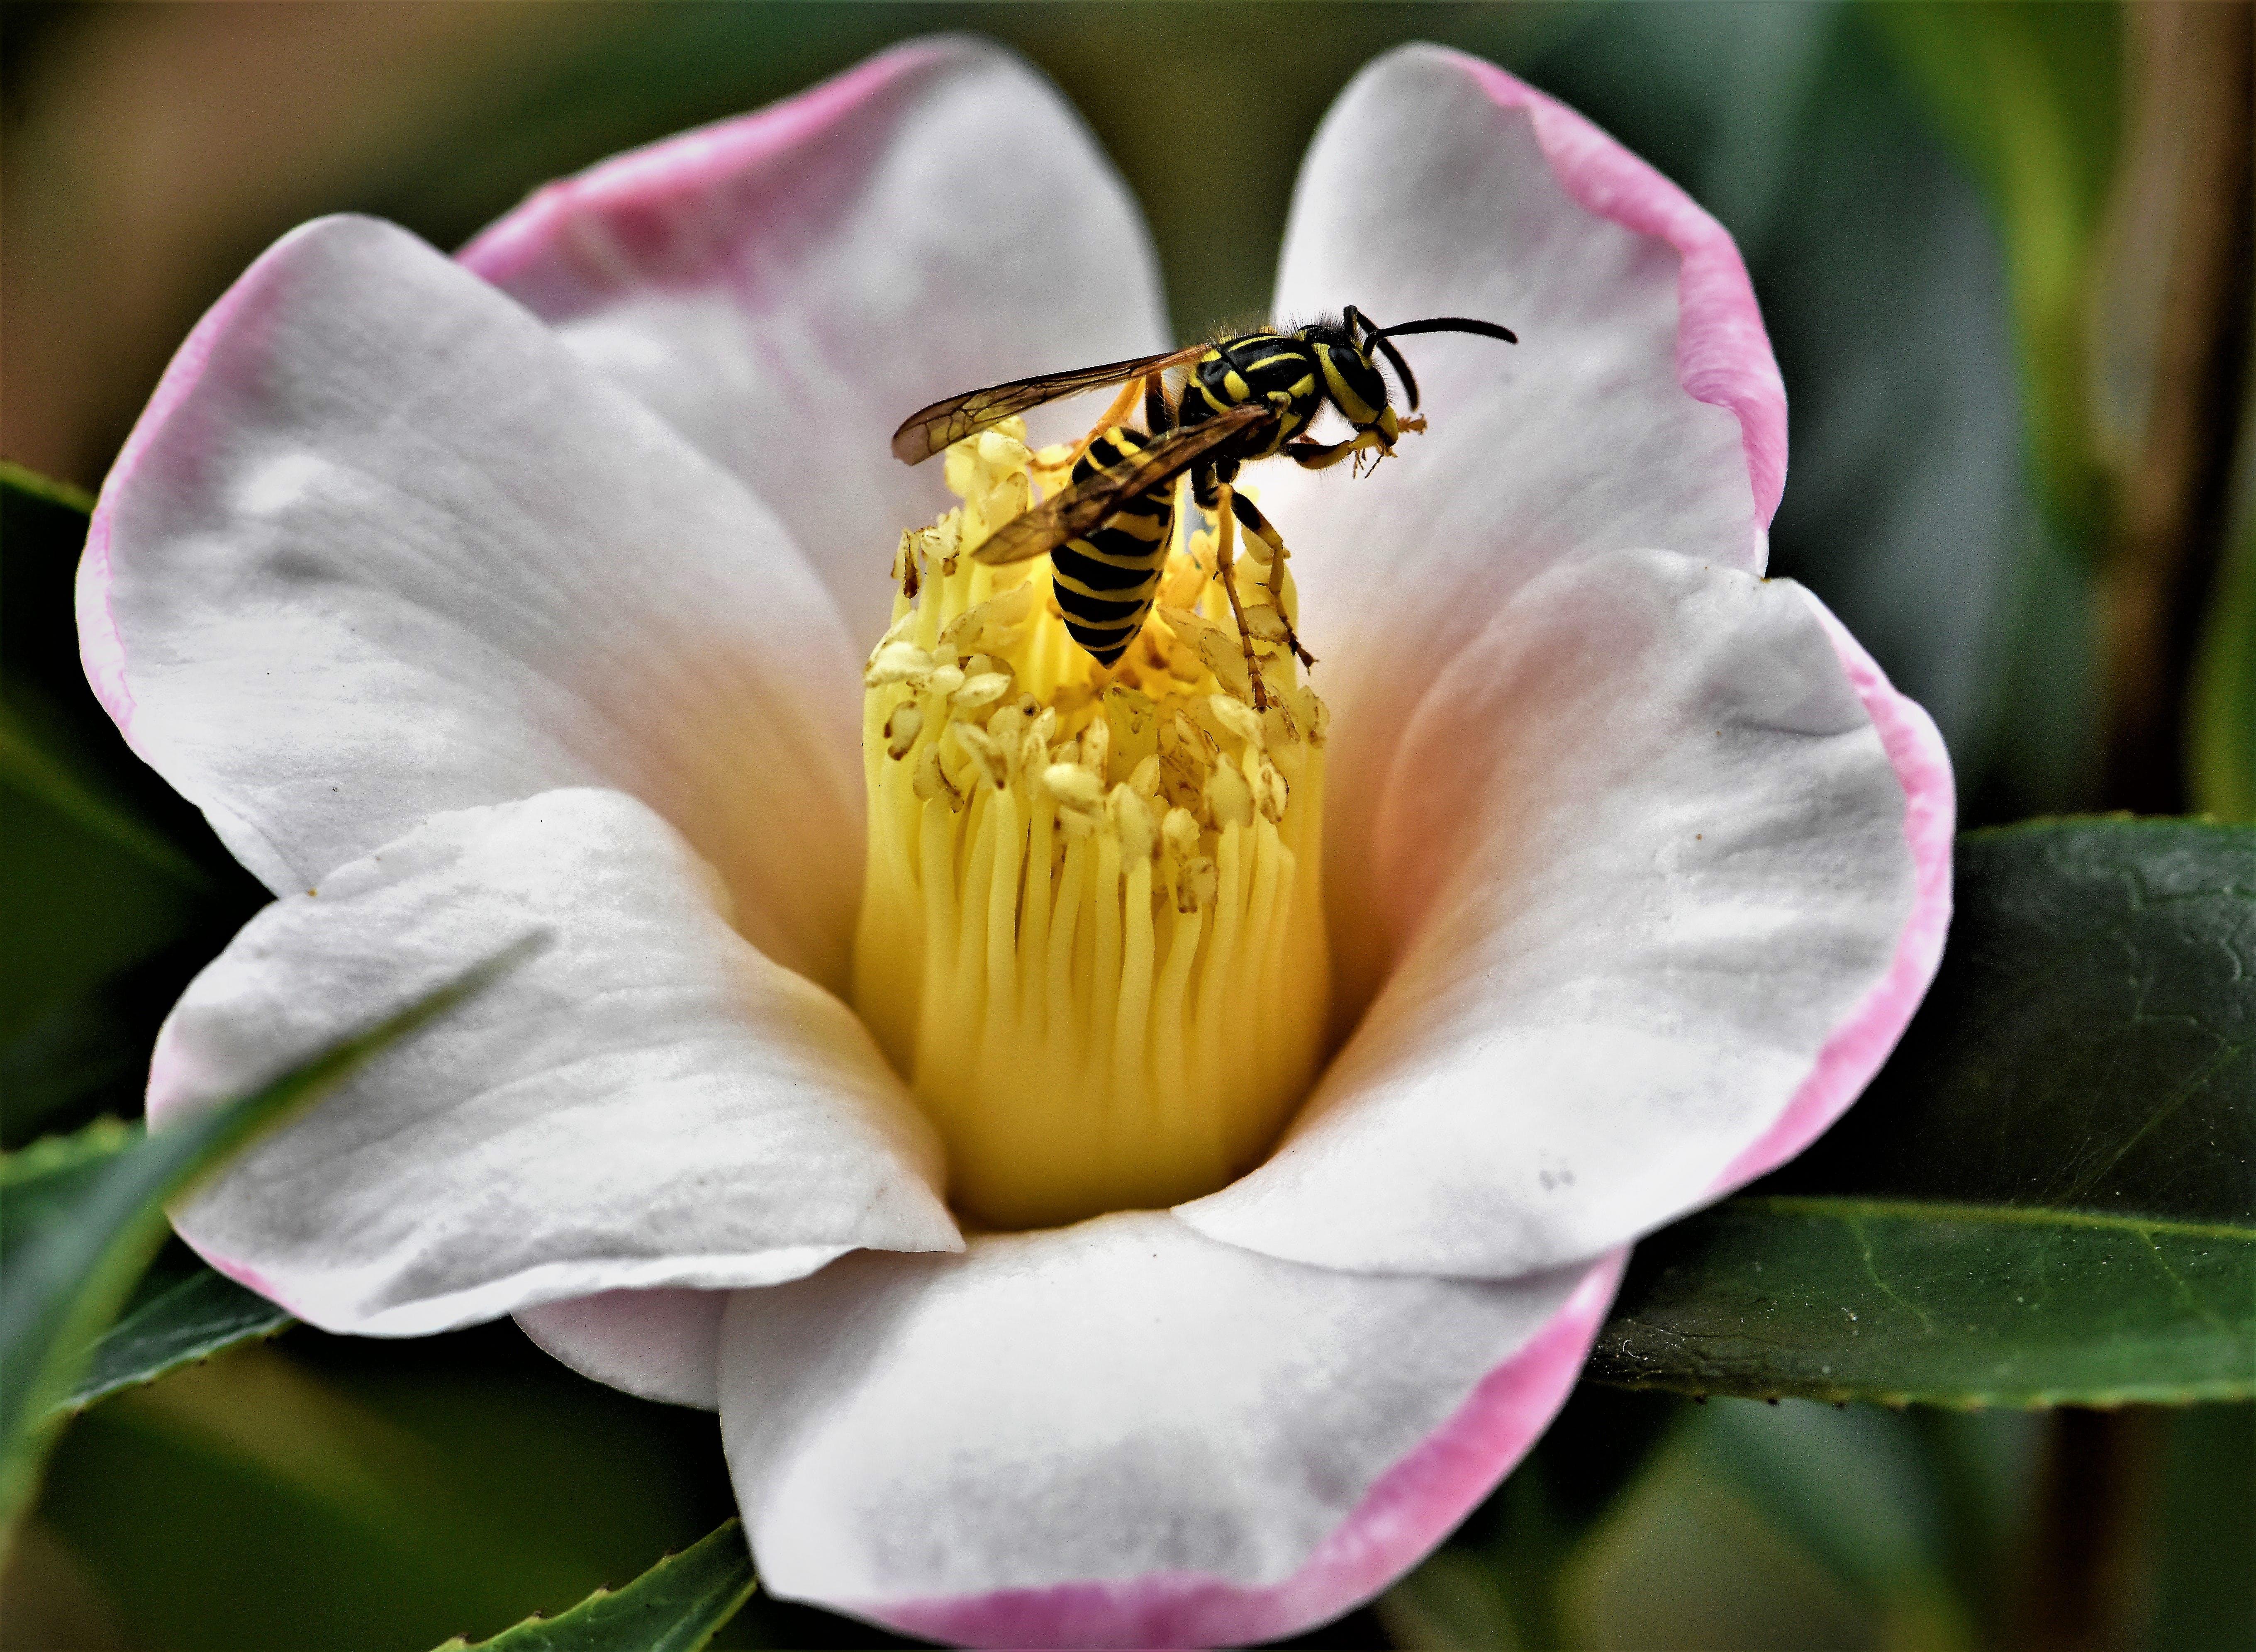 Free stock photo of Wasp on Camelia